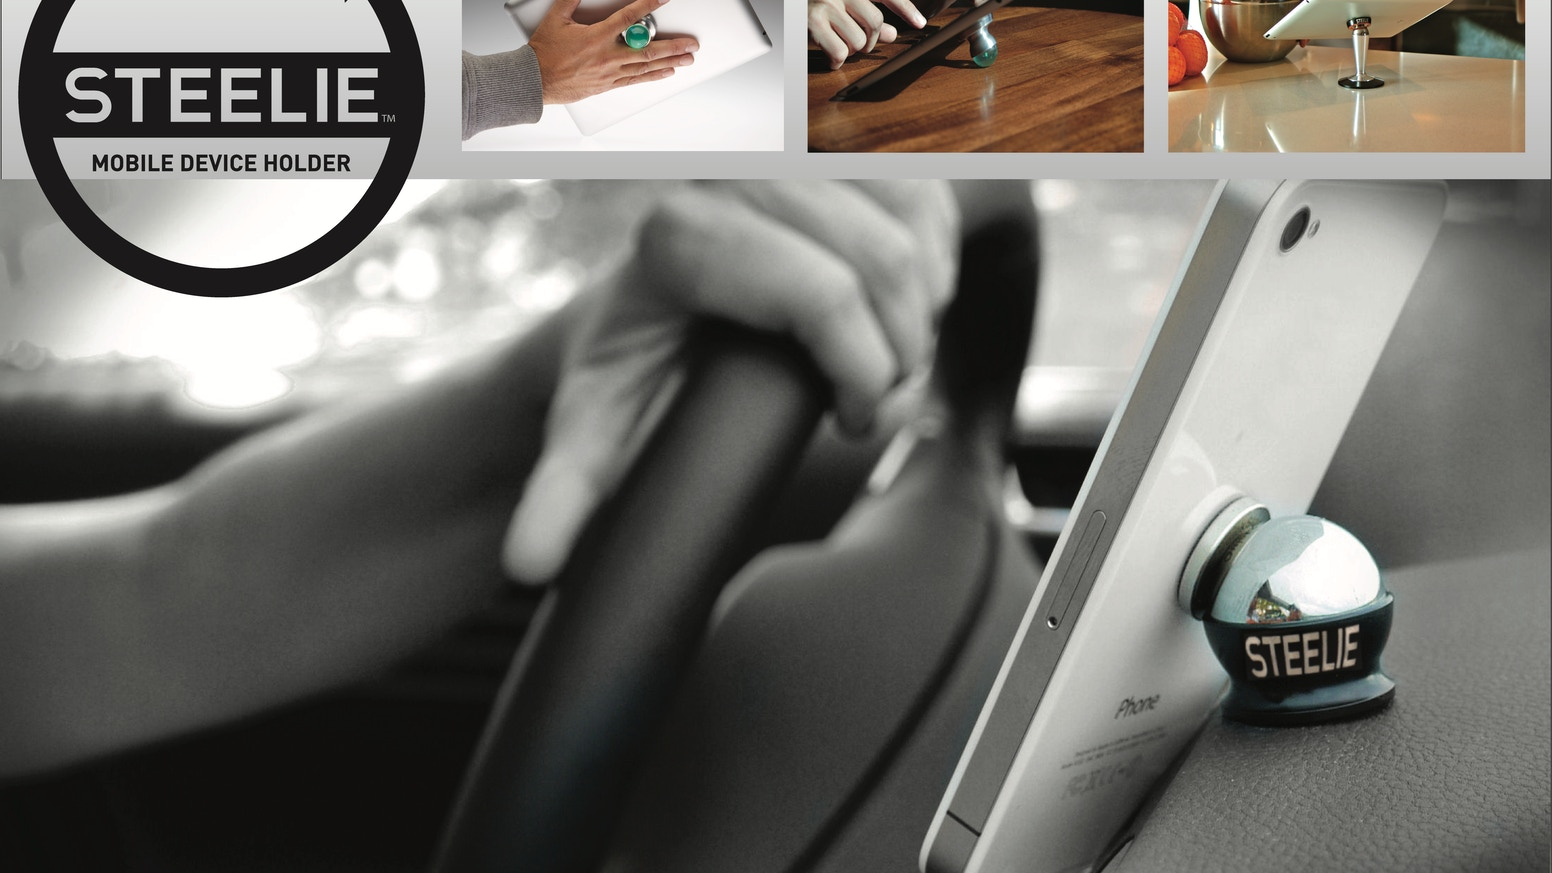 Ipad Holder Car Seat Headrest Coat Suit Jacket Clothes Hanger Mount Middle Back